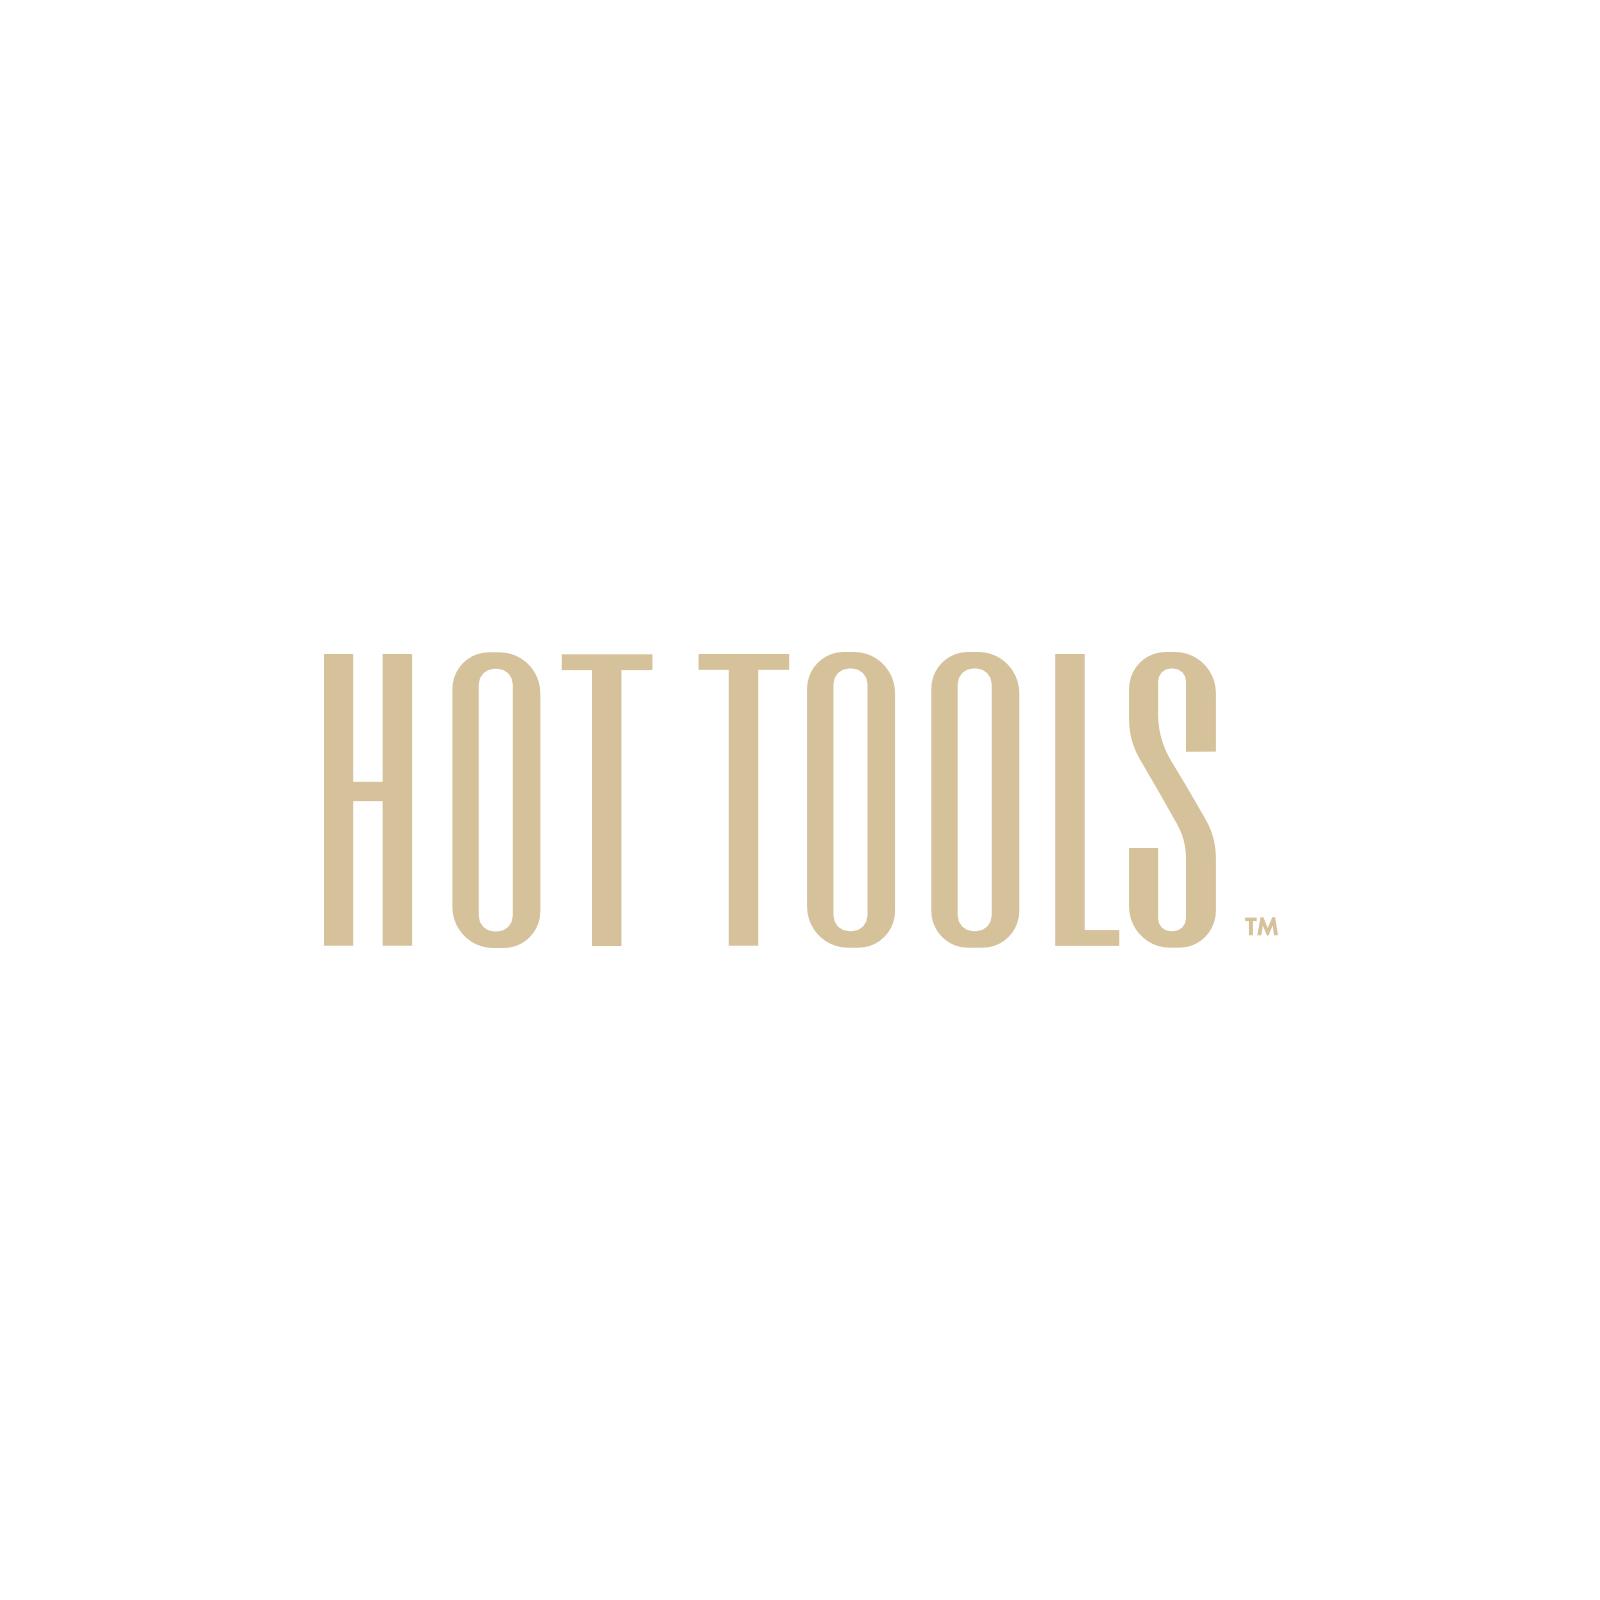 Hot Tools® Signature Series Salon Digital Flat Iron, 1 Inch product image